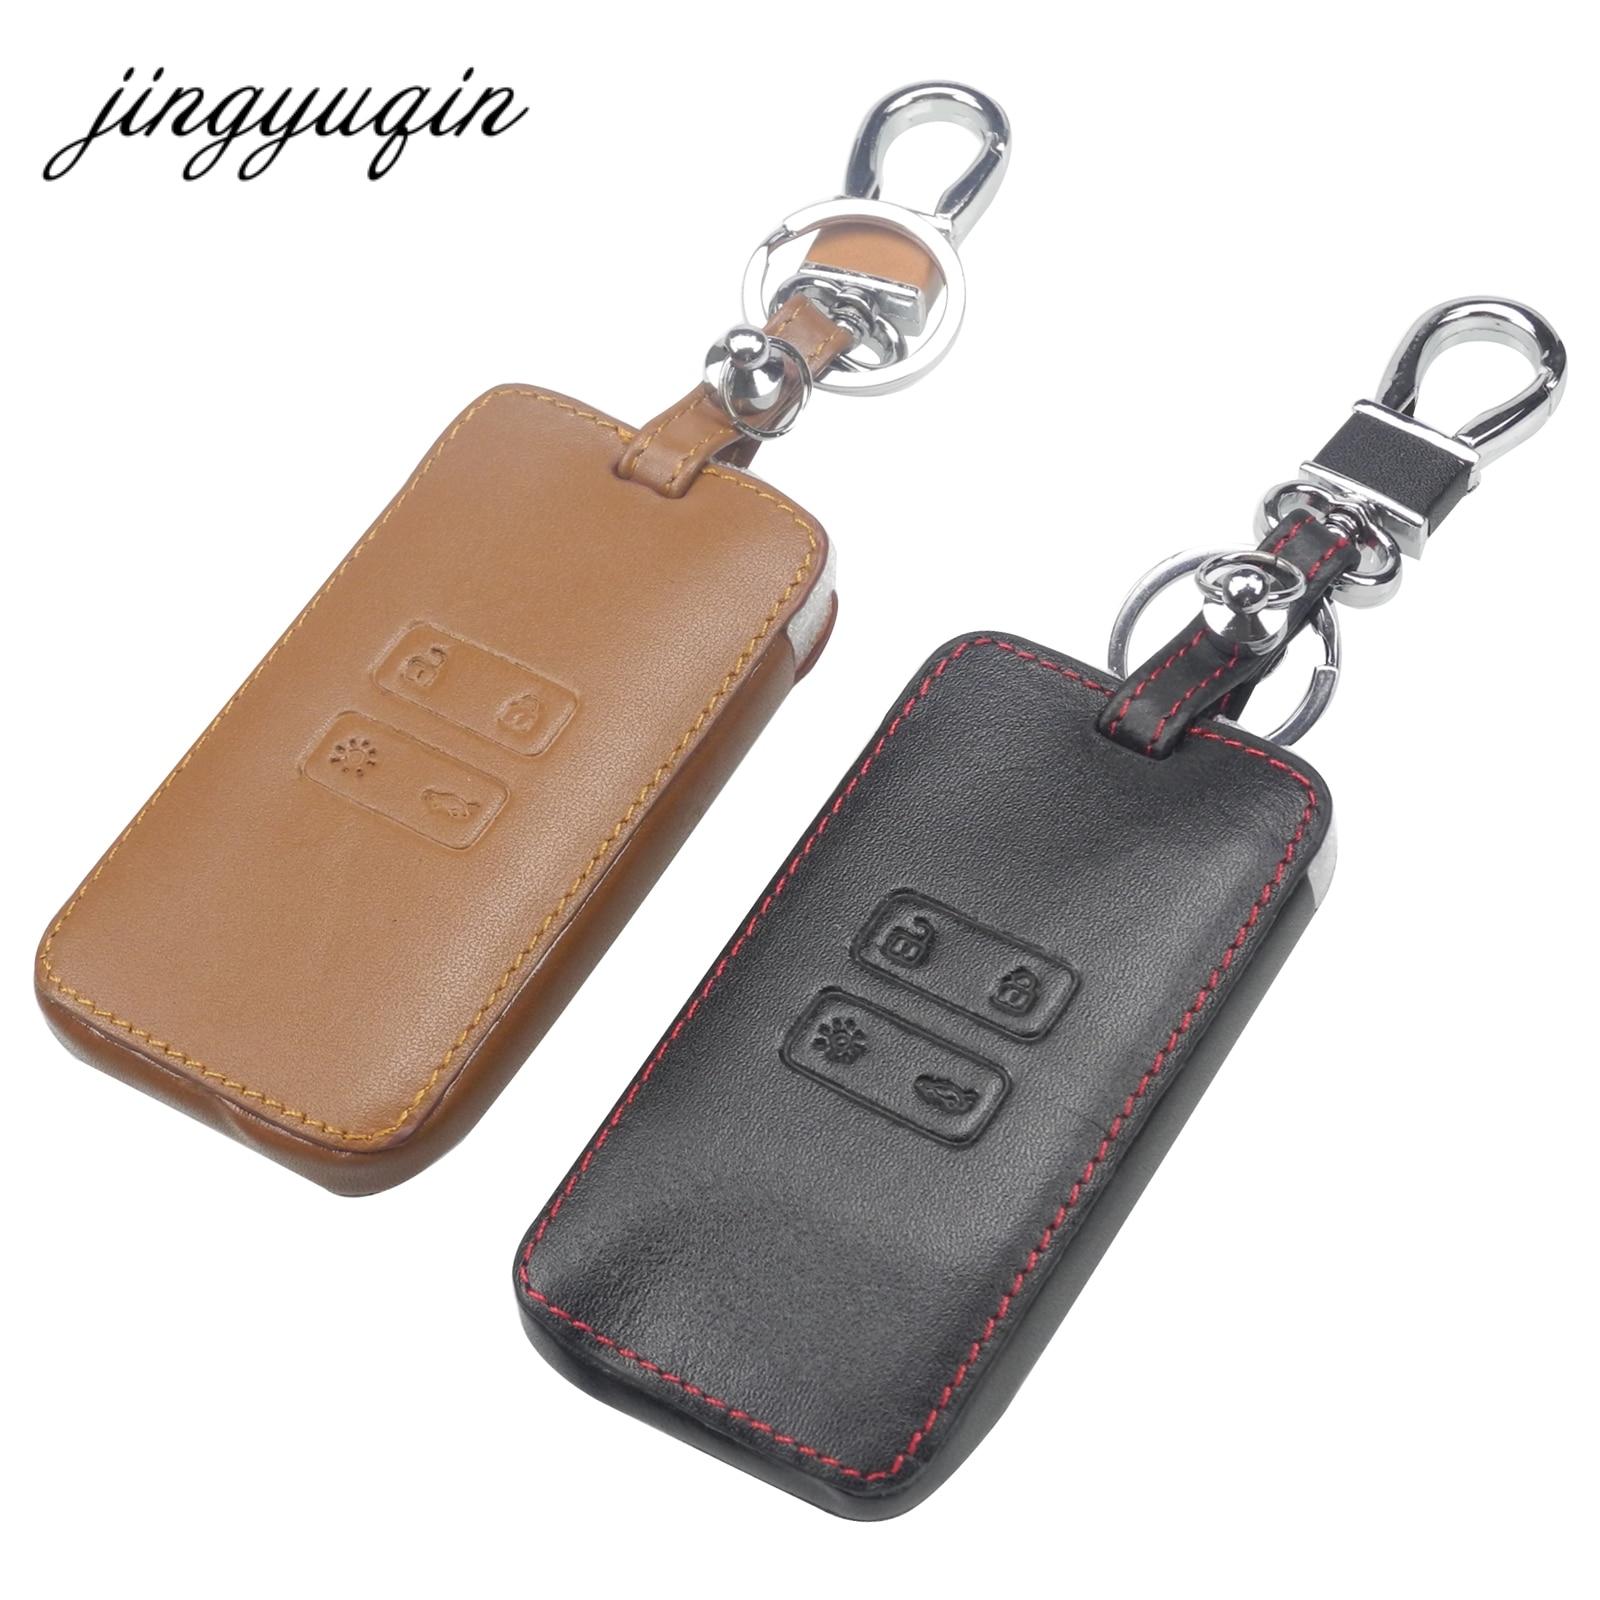 jingyuqin leather car key card cover case fit for renault. Black Bedroom Furniture Sets. Home Design Ideas